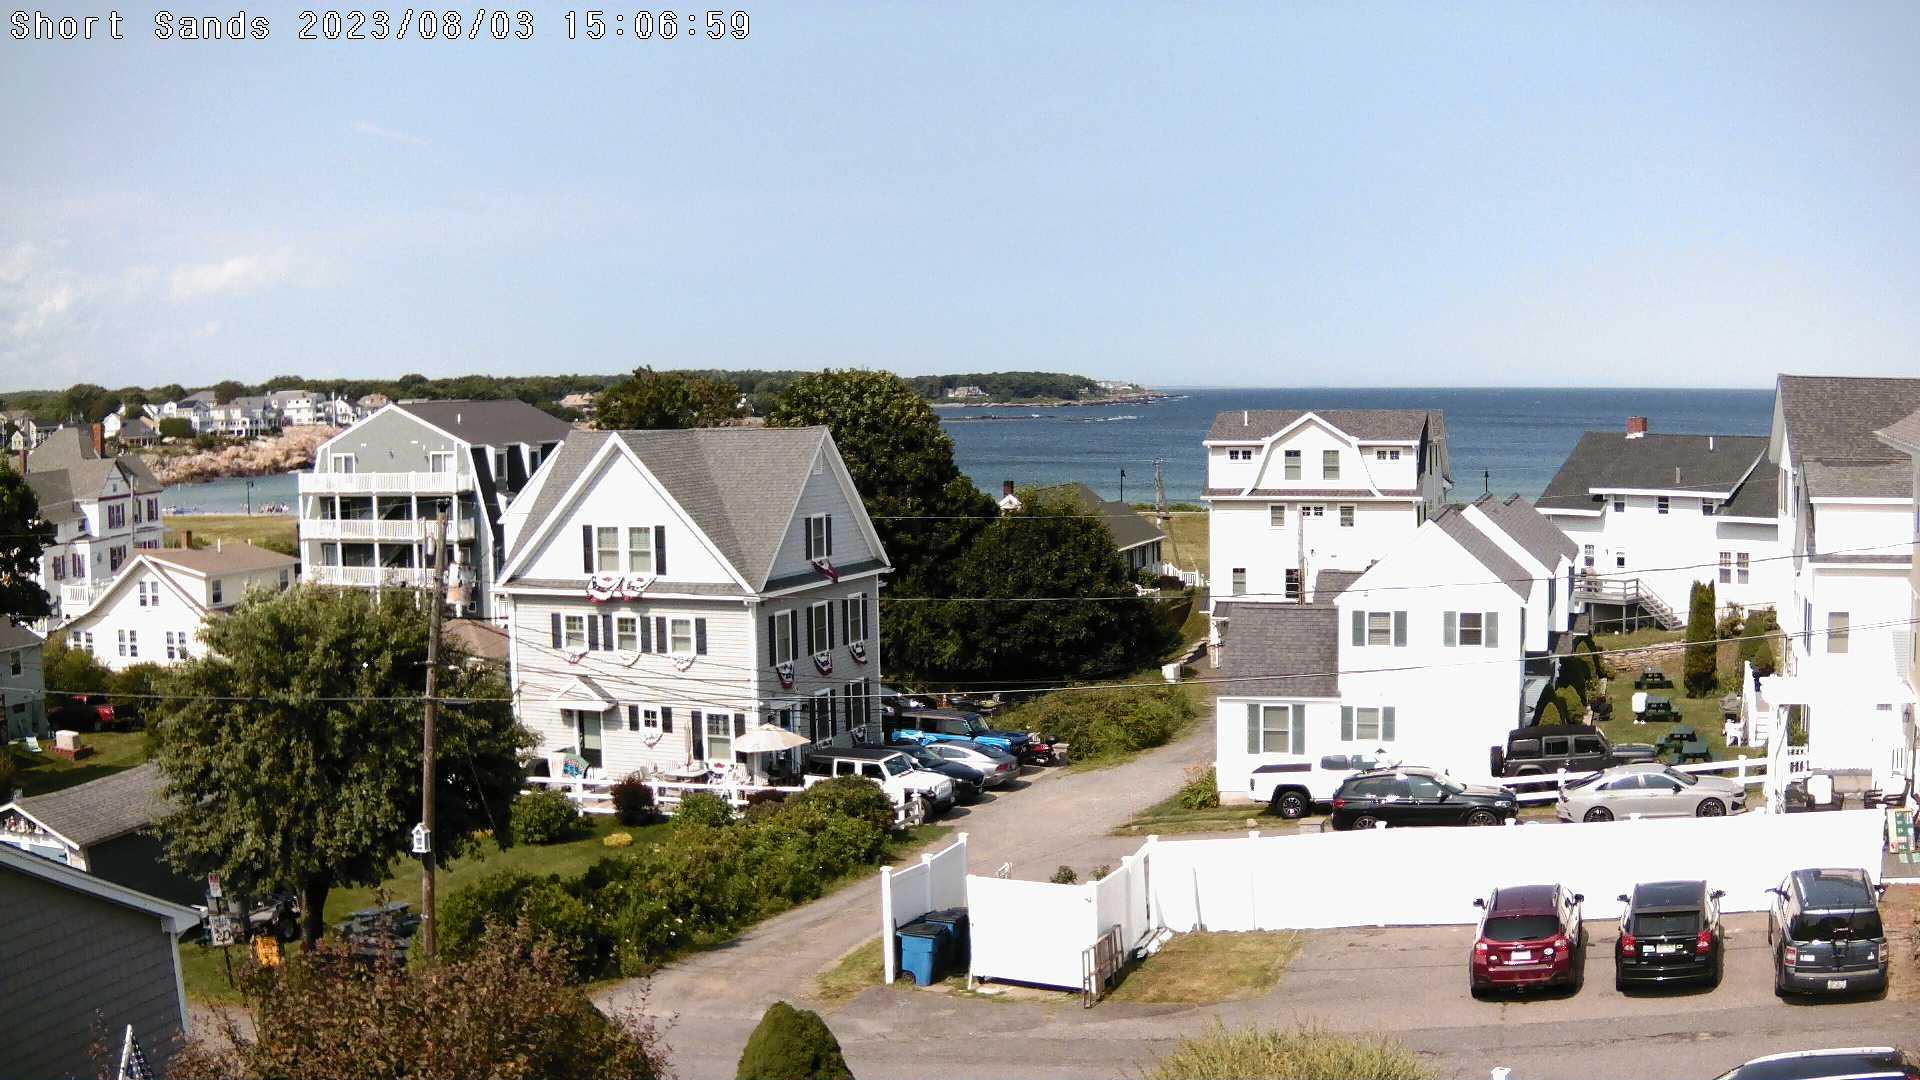 York Beach, Maine Ven. 15:07